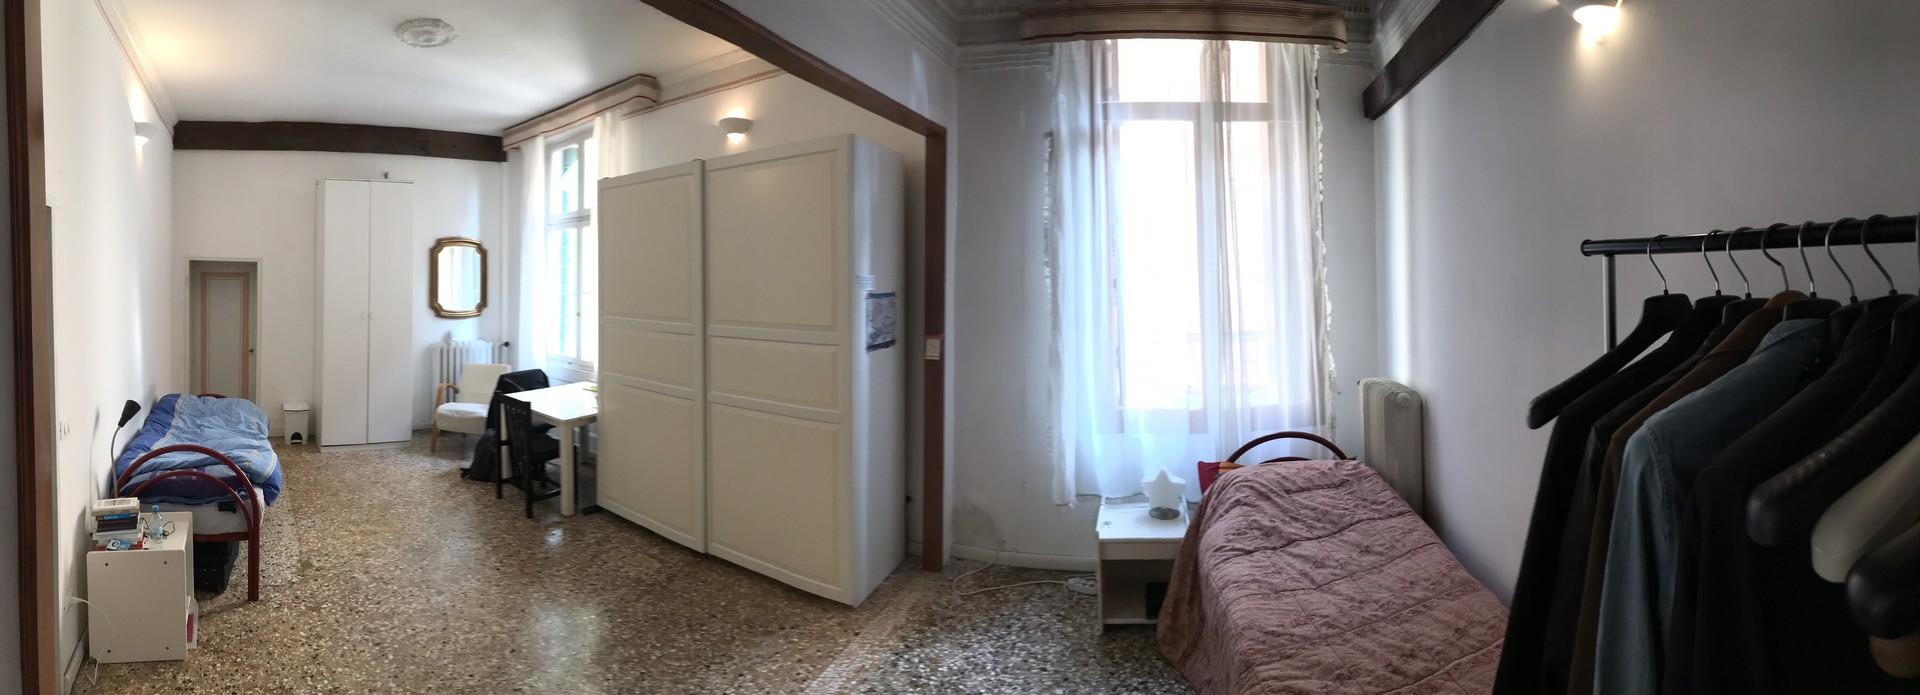 place-double-room-4c75fee15c81d21ef3ba687055c67759